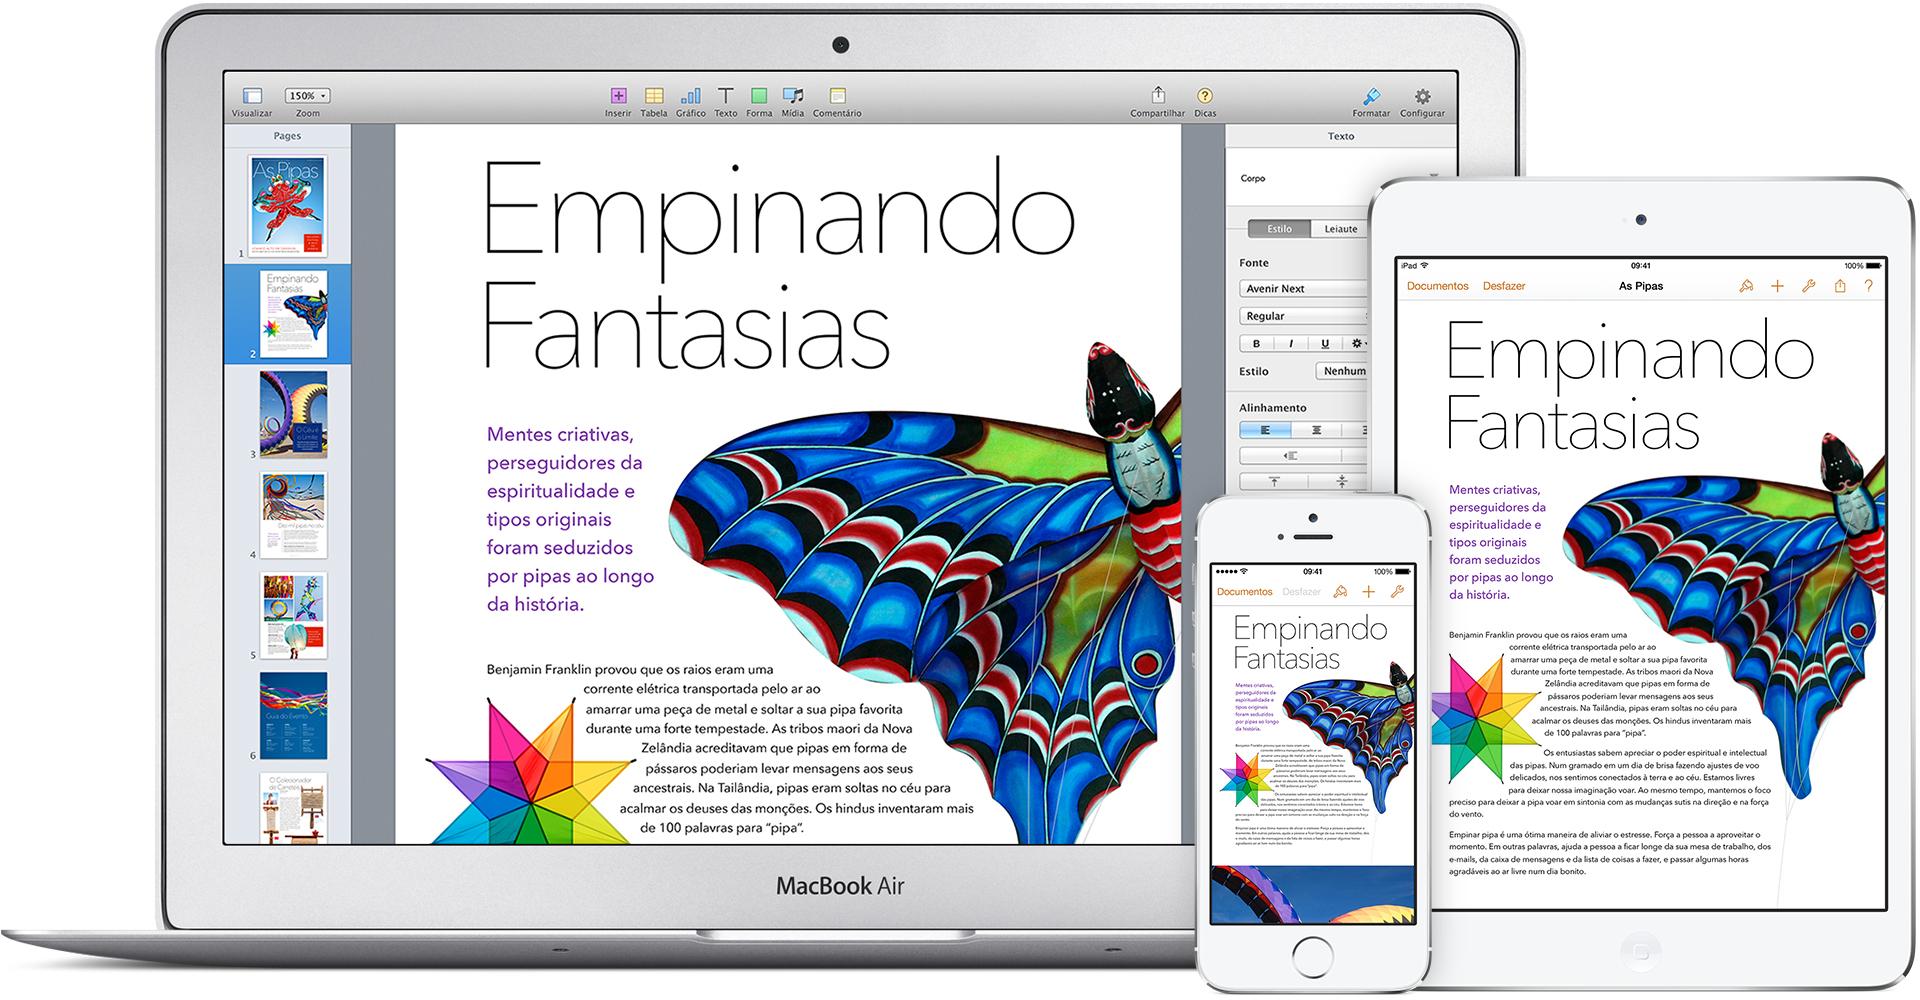 iWork (Pages) para iOS e OS X